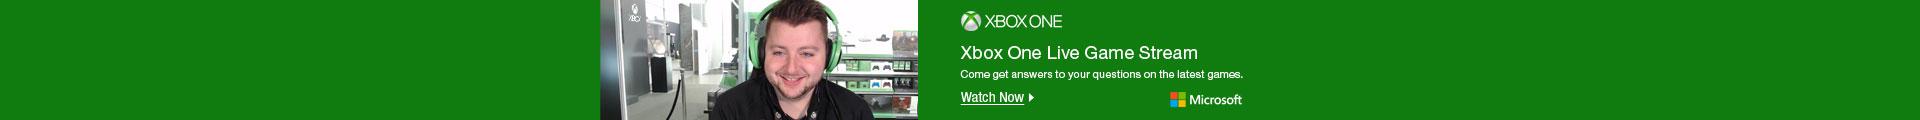 xbox one live game stream